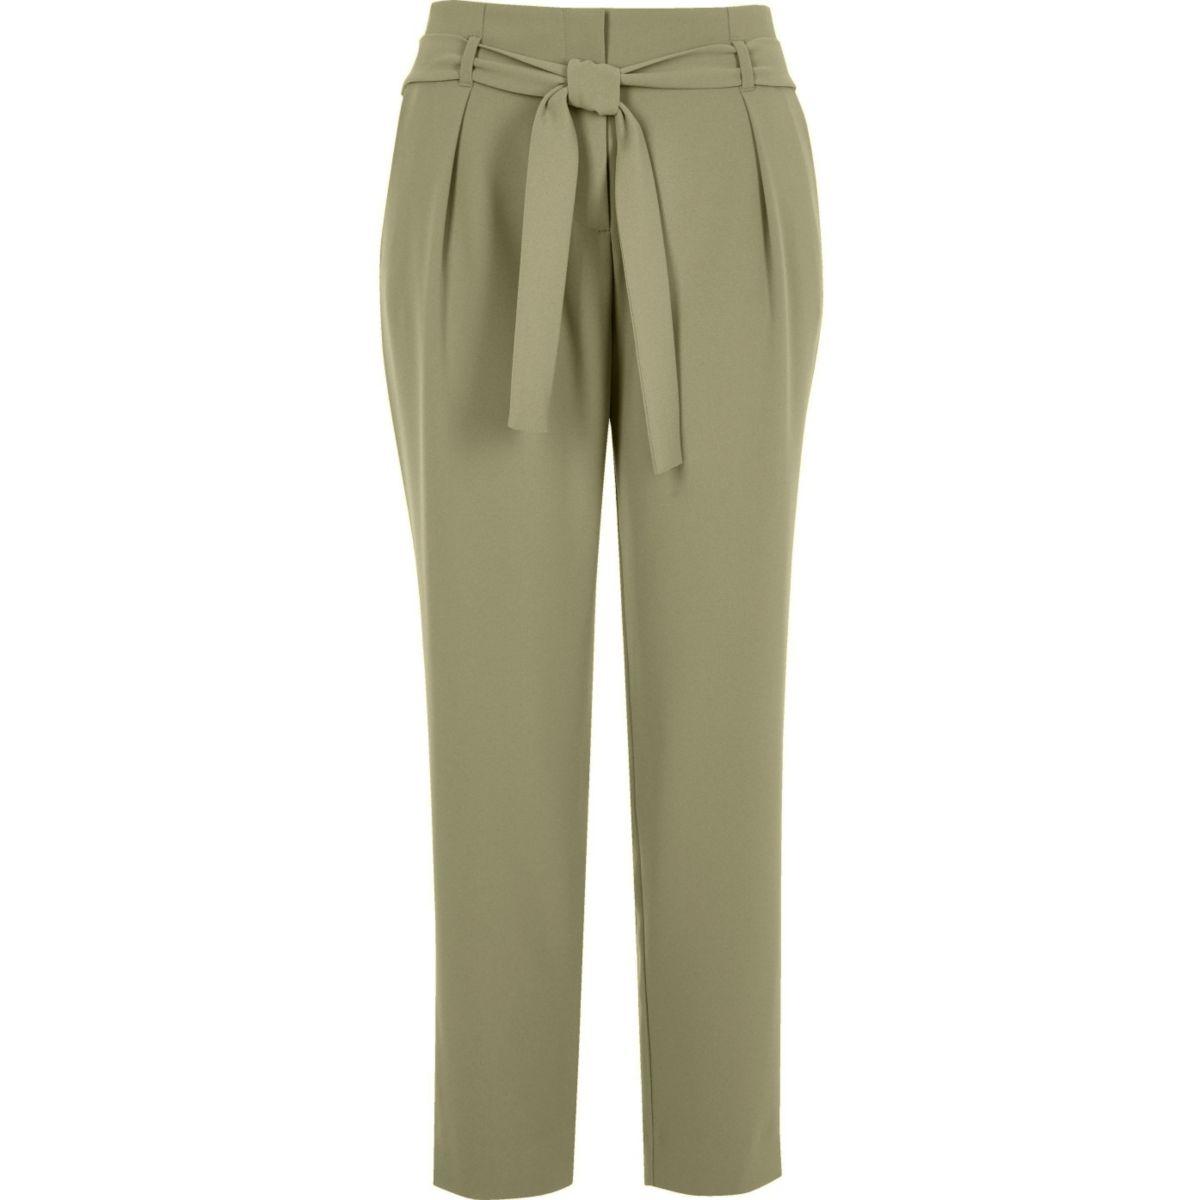 Light green soft tie waist tapered pants